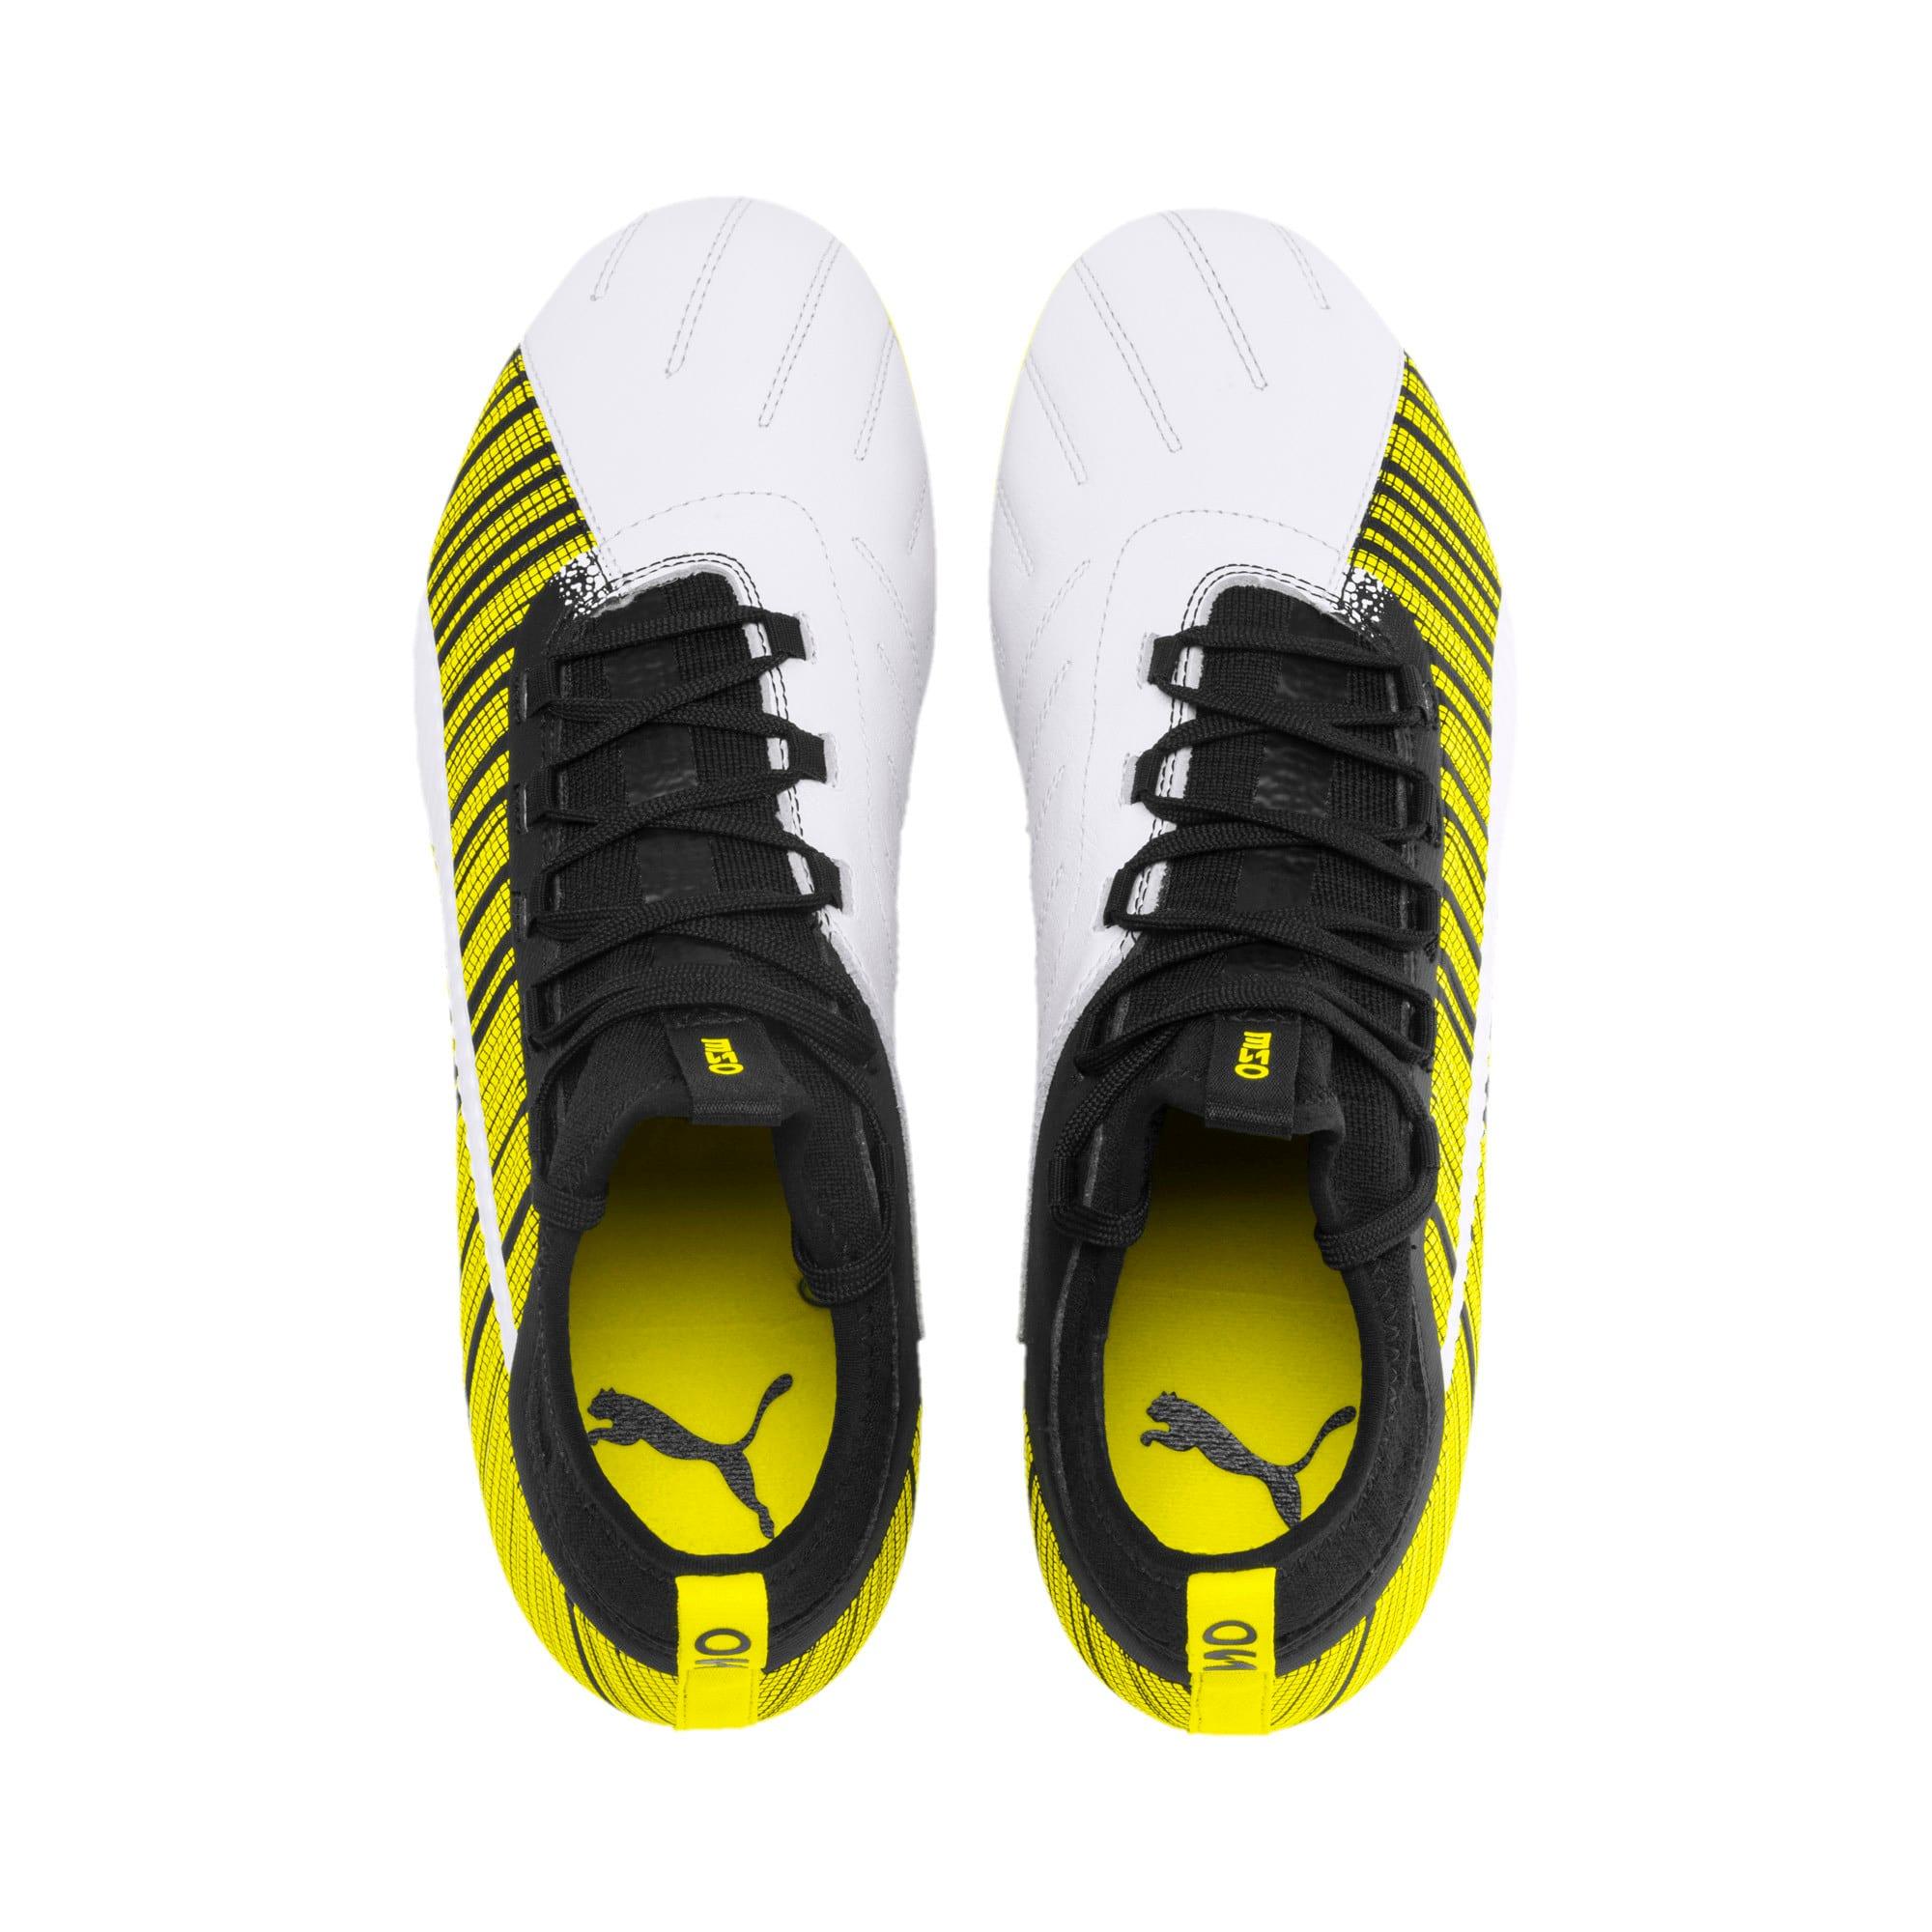 Thumbnail 7 of PUMA ONE 5.3 FG/AG Men's Football Boots, White-Black-Yellow Alert, medium